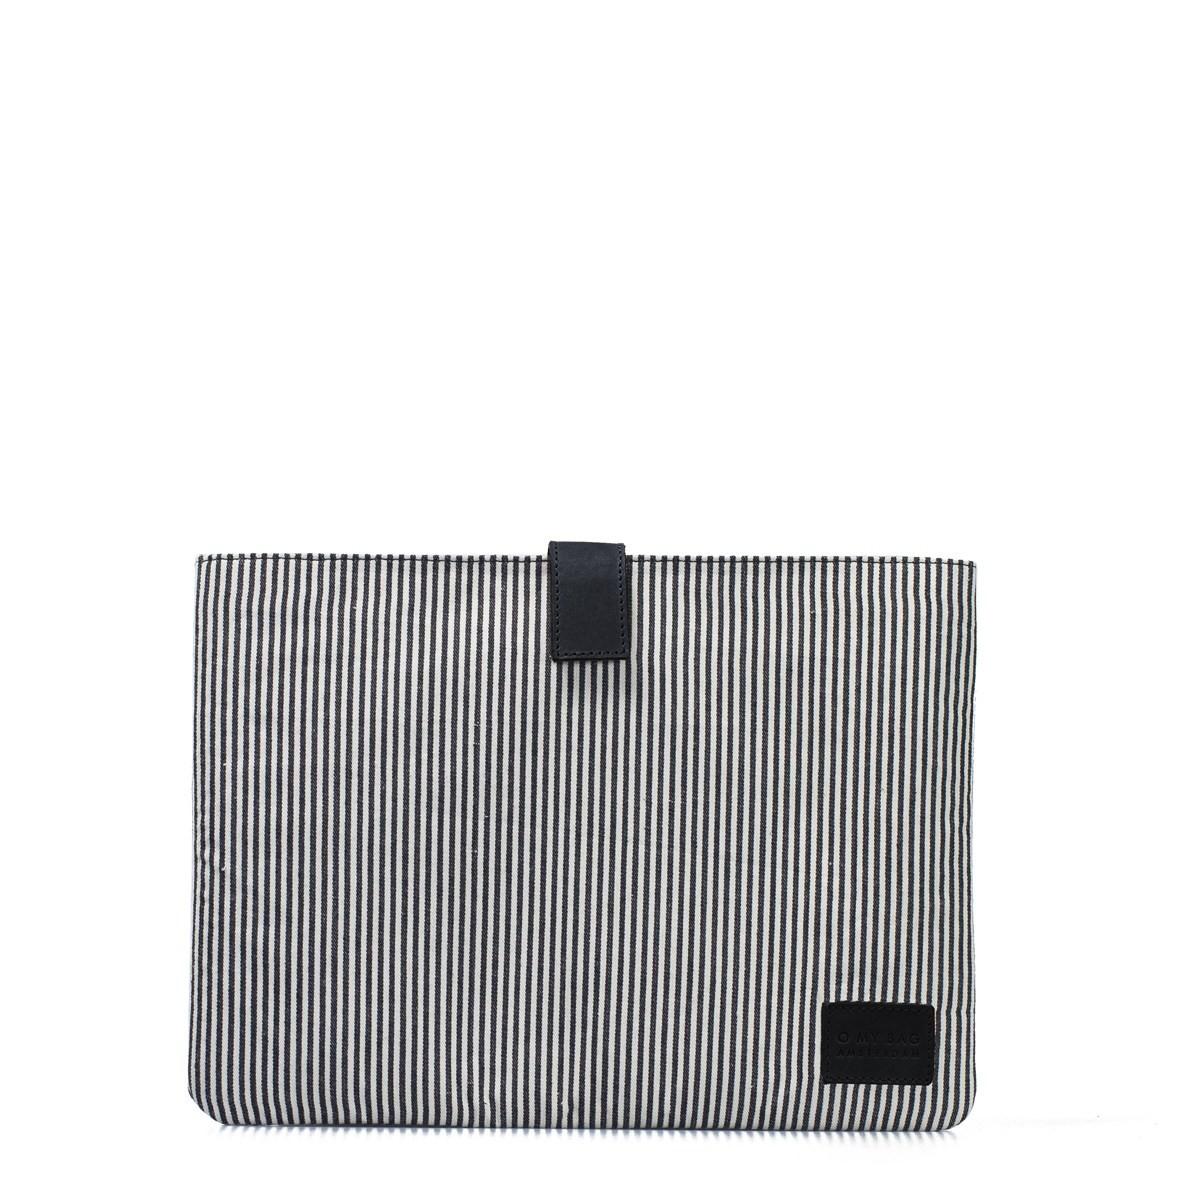 "Laptop Sleeve 13"" Cotton/Eco-Black"